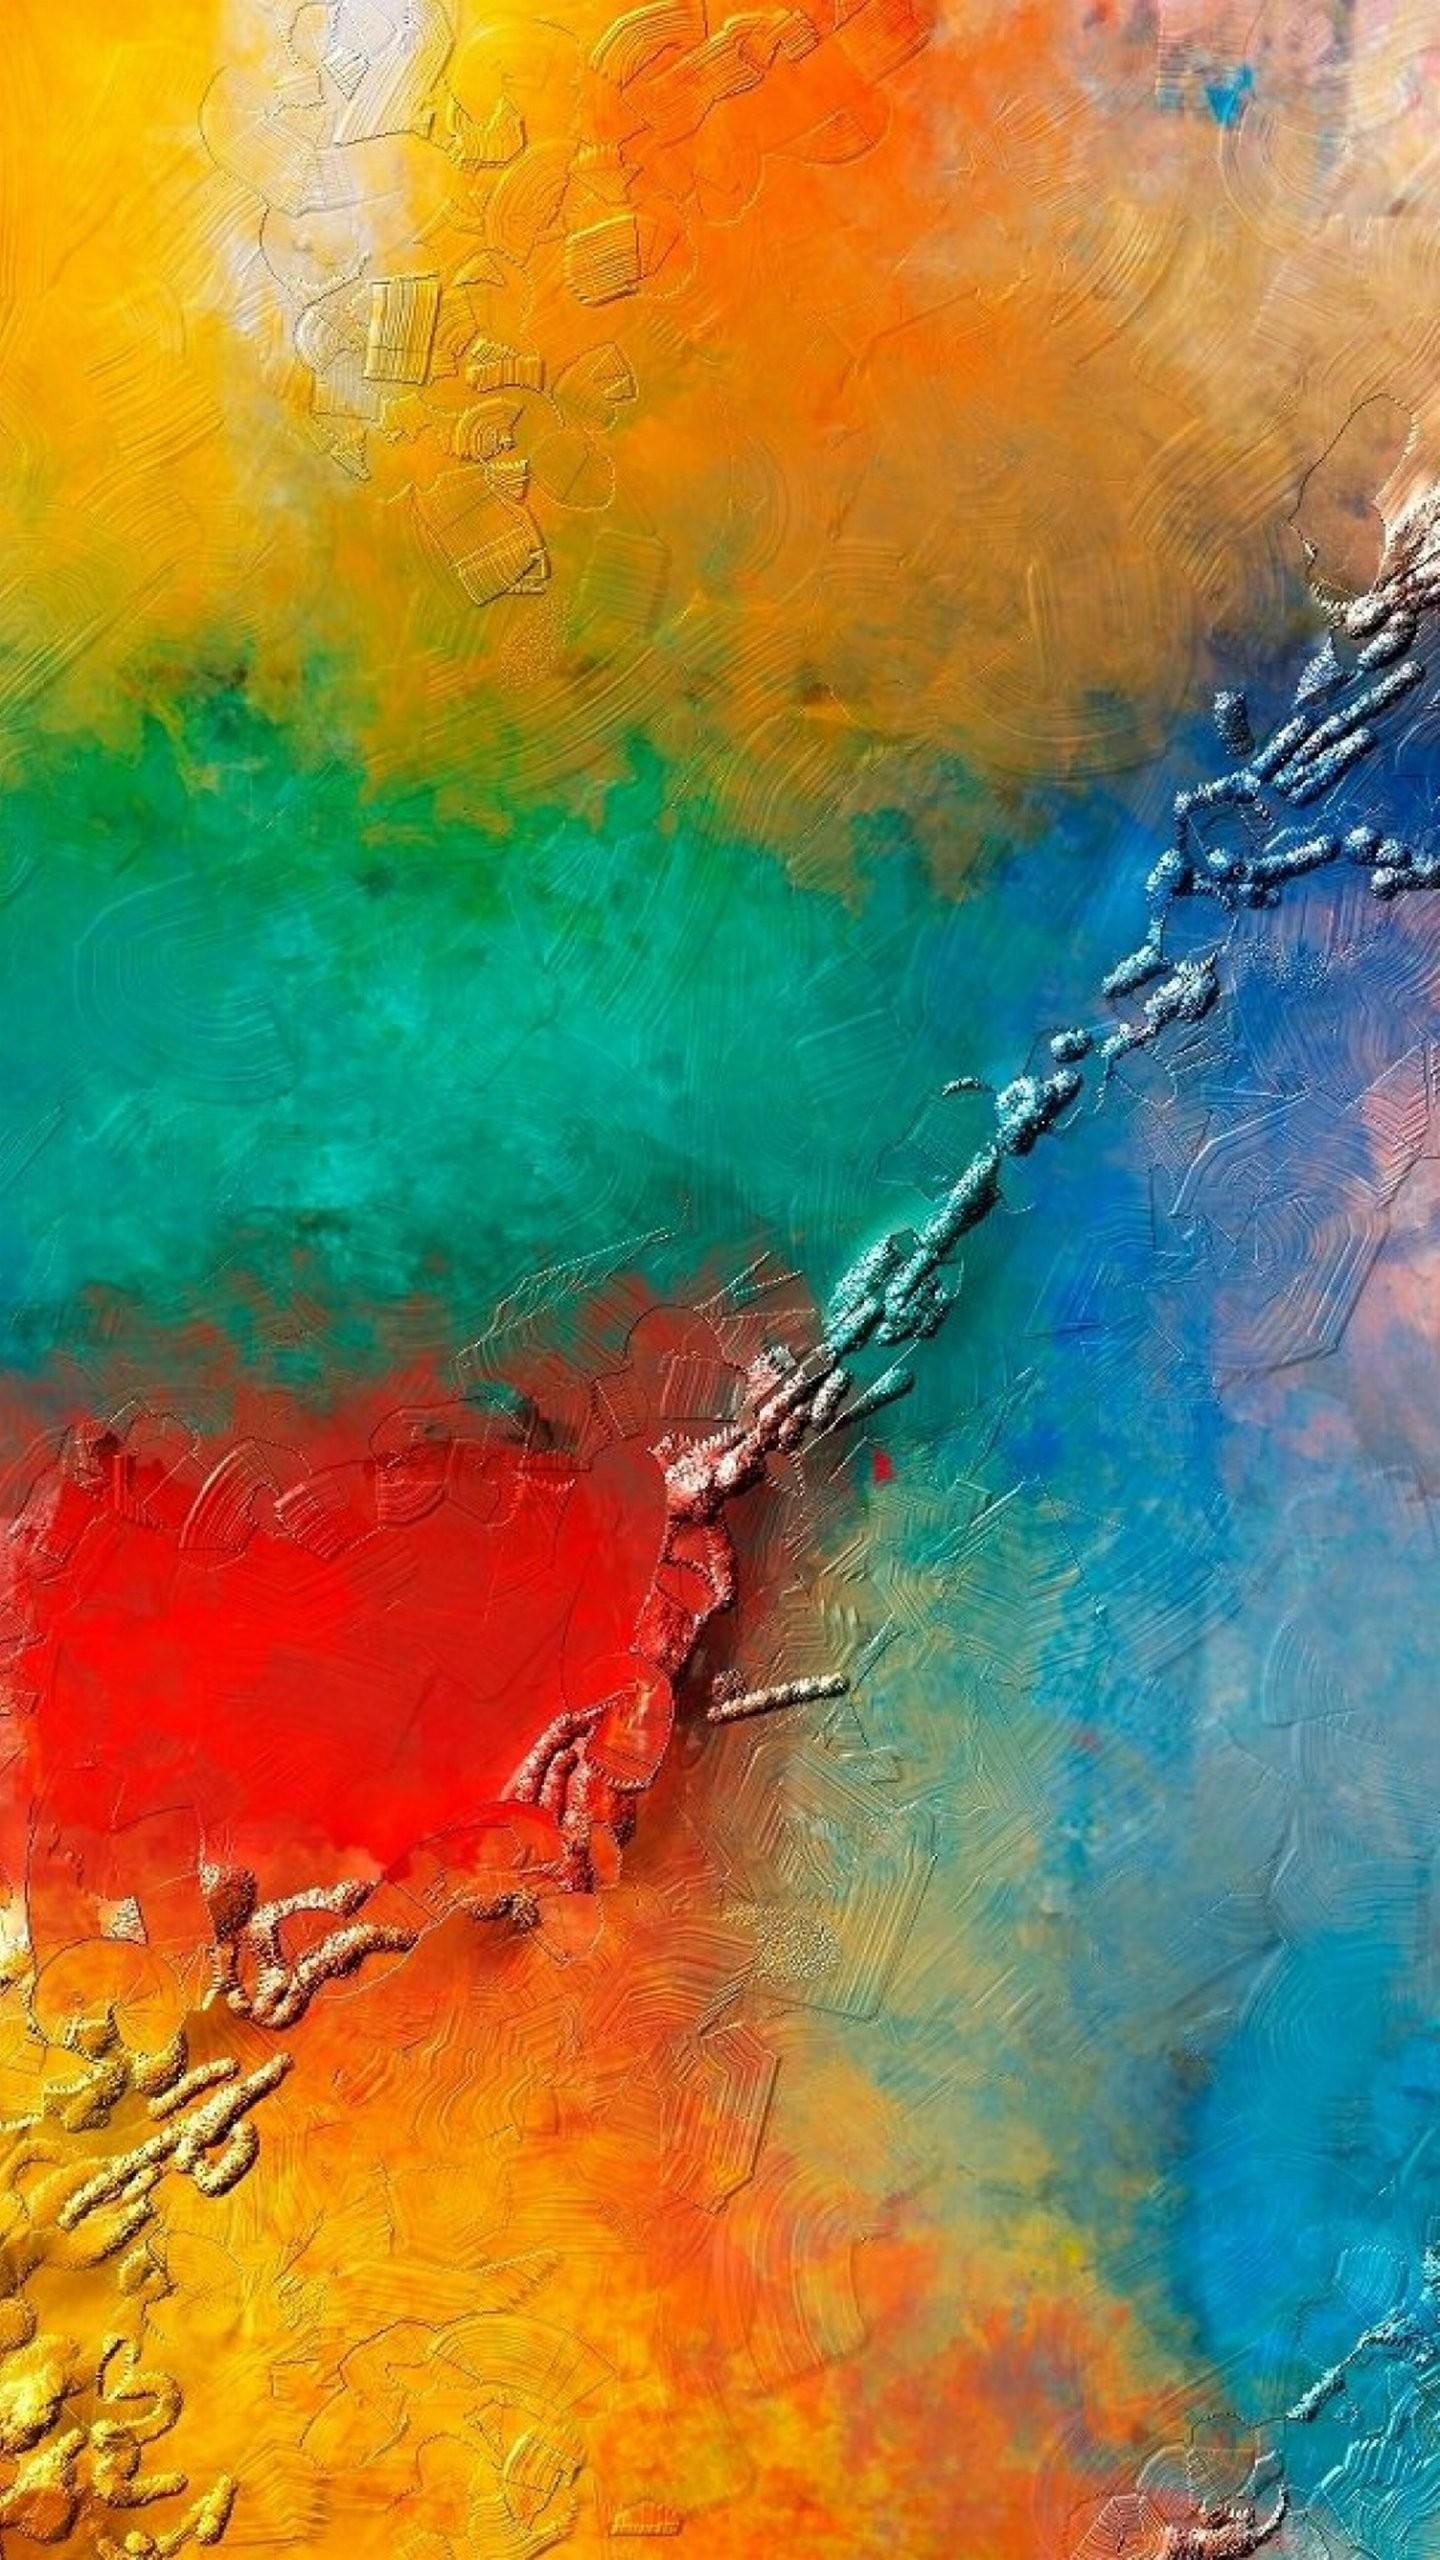 Qhd Wallpaper ·① Download Free Beautiful Hd Backgrounds